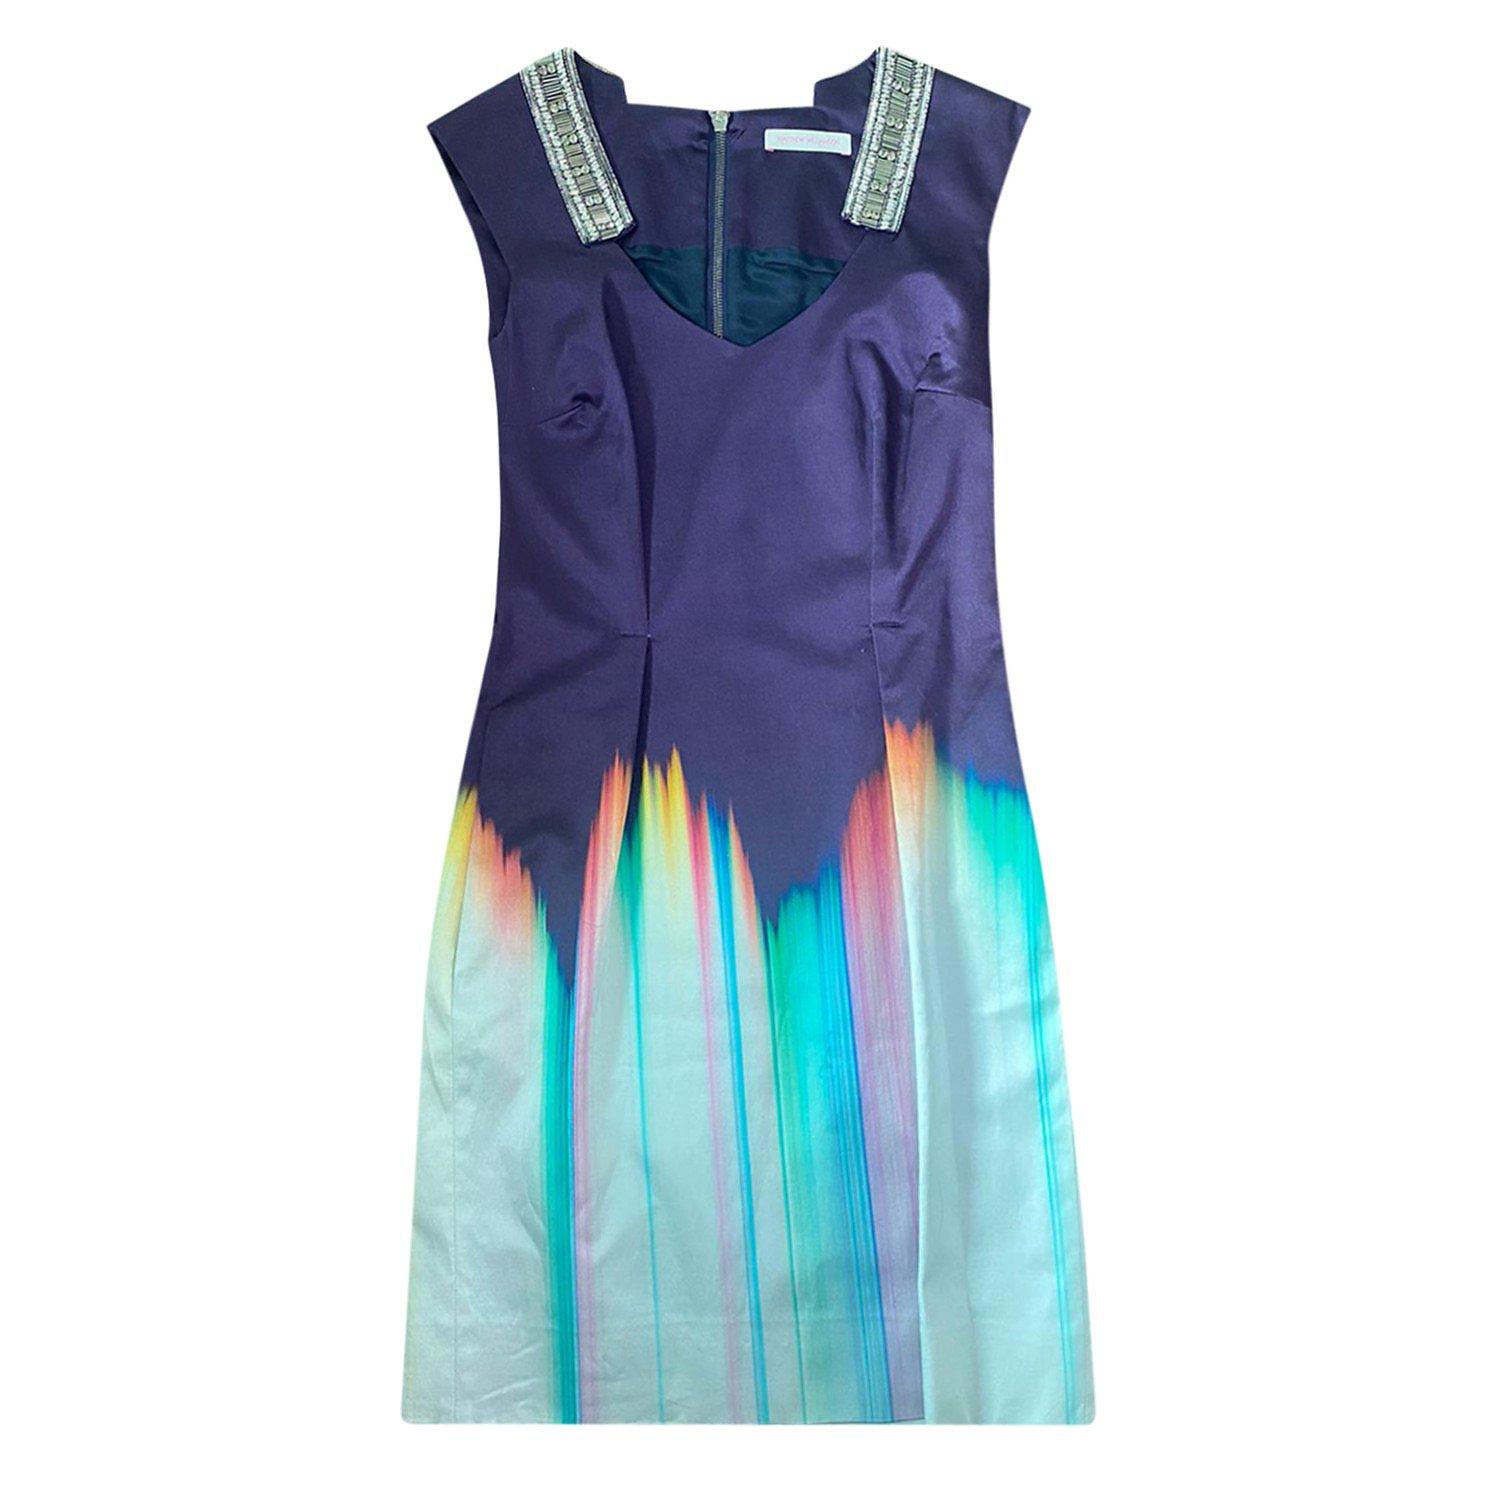 Matthew Williamson Embellished Gradient Dress